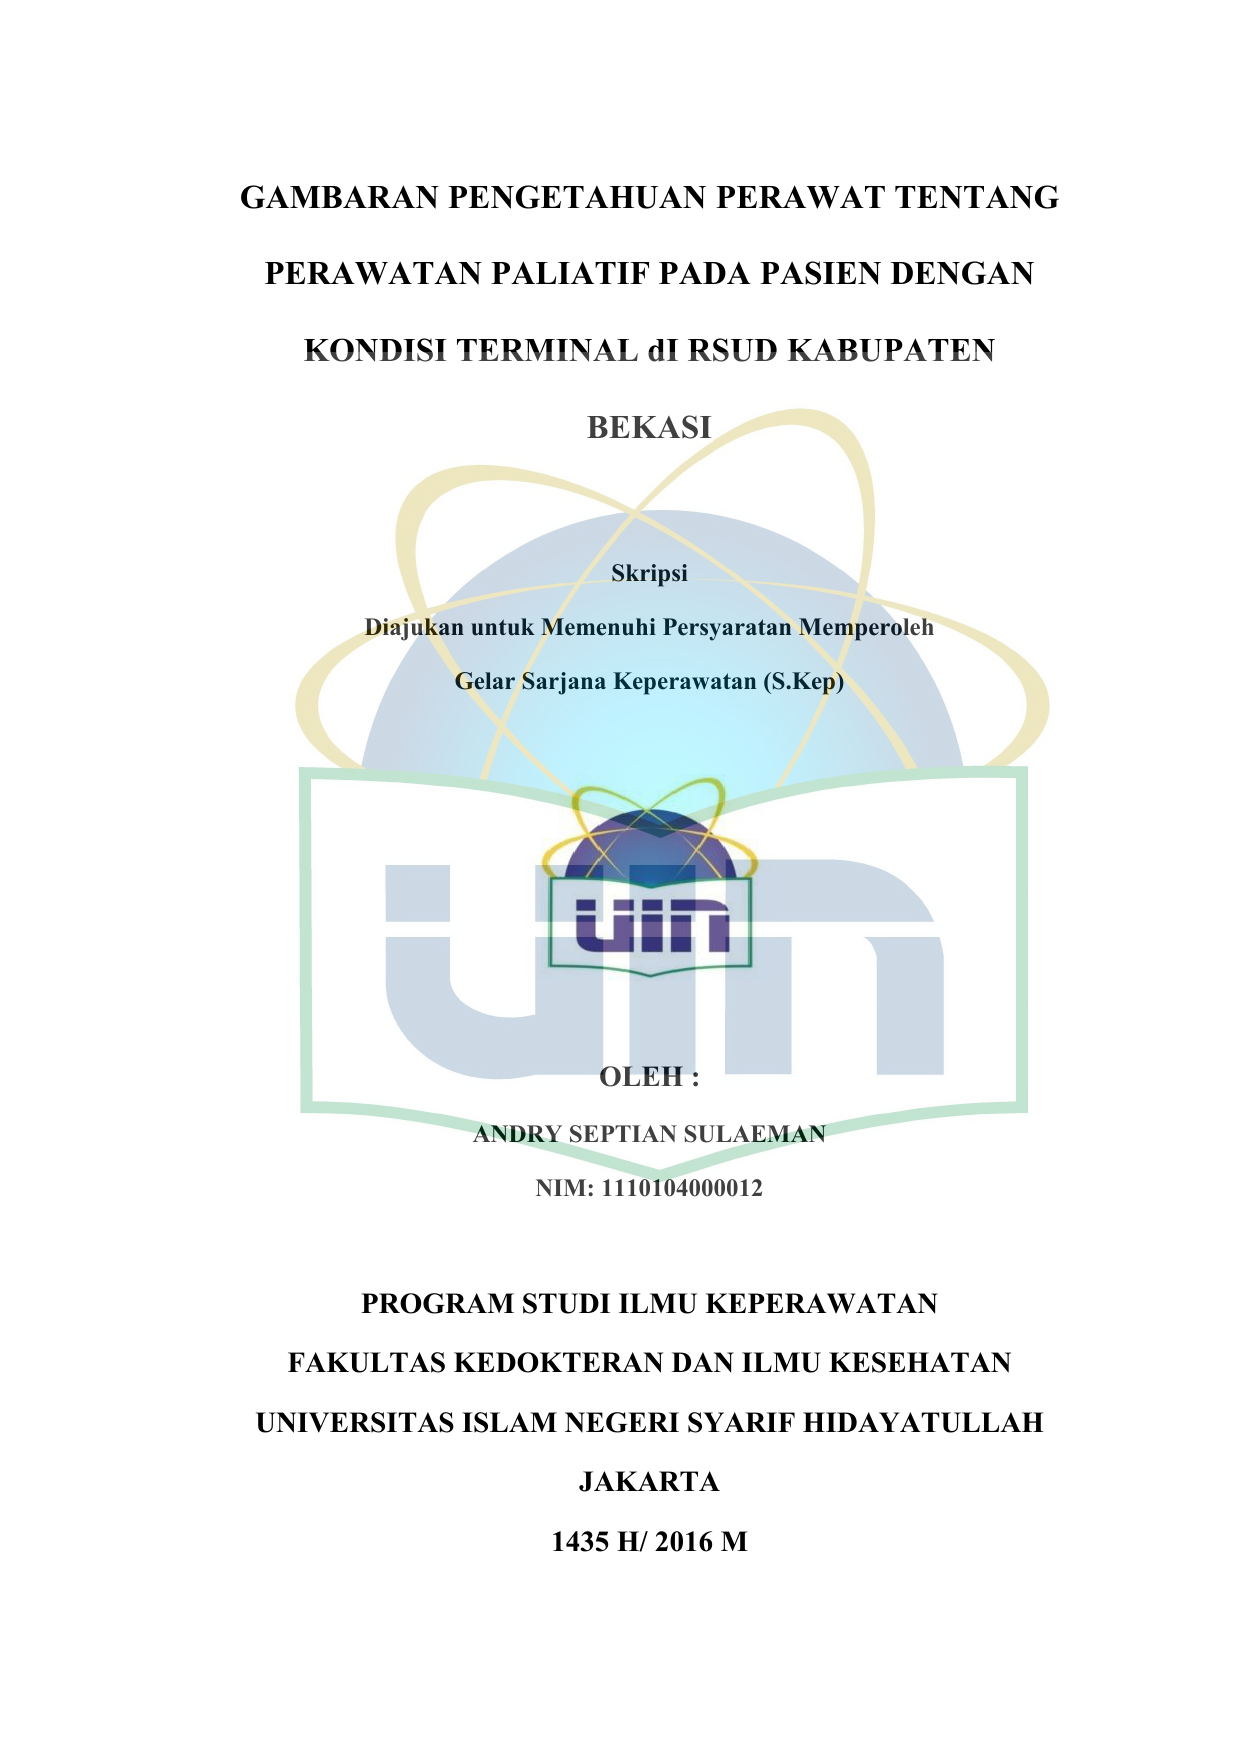 Skripsi Gambaran Pengetahuan Perawat Dalam 2019 08 09آ Skripsi Gambaran Pengetahuan Perawat Dalam Pemilahan Pdf Document